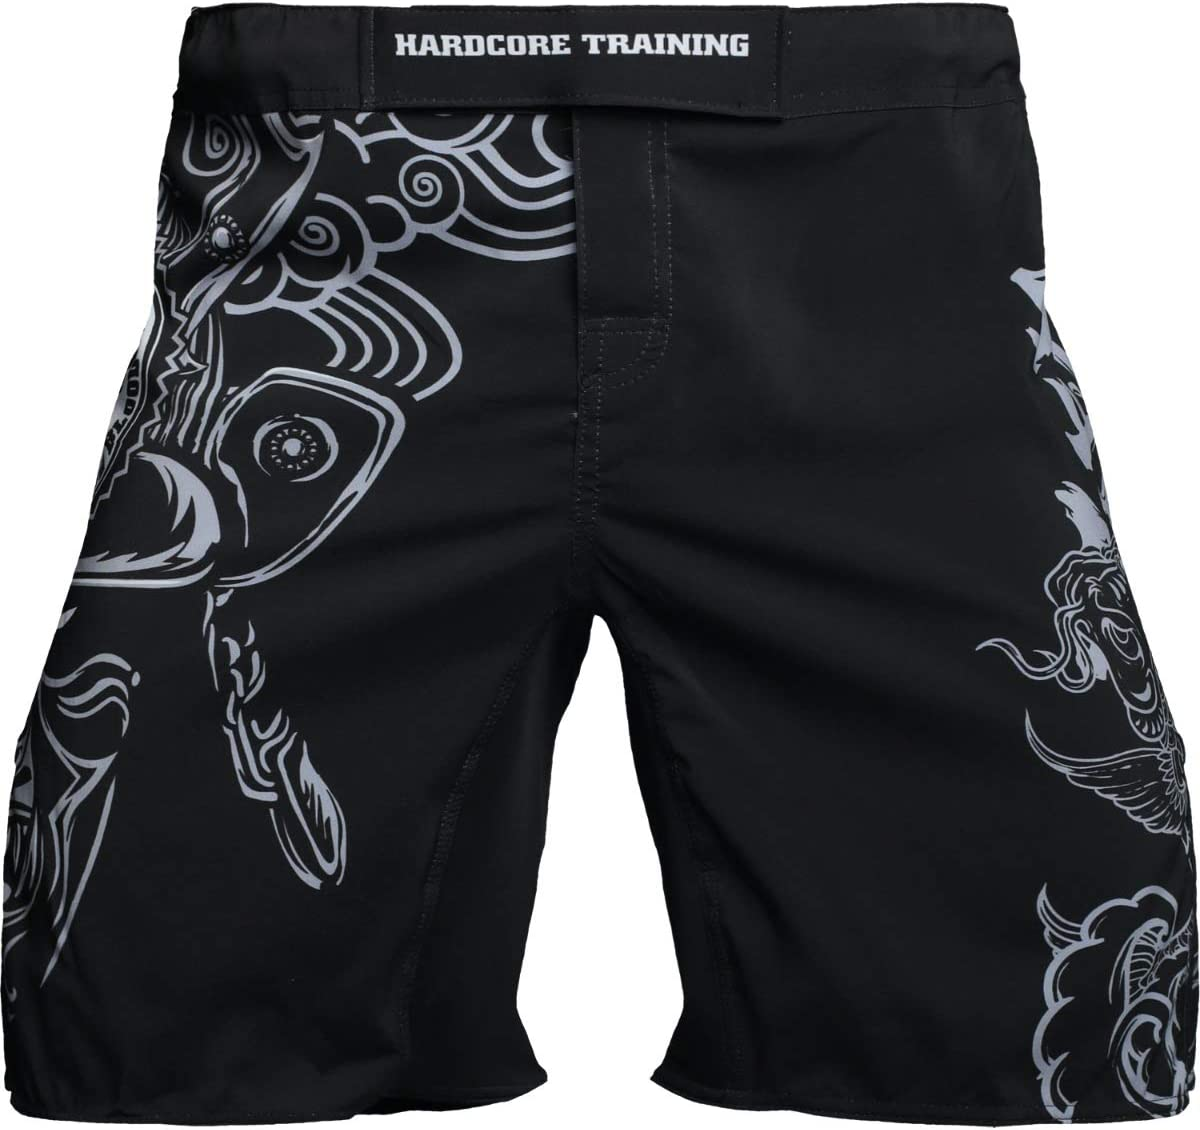 Hardcore Training Fight Shorts Mens Koi Pantalones Cortos Hombre MMA BJJ Fitness Artes Marciales Boxeo